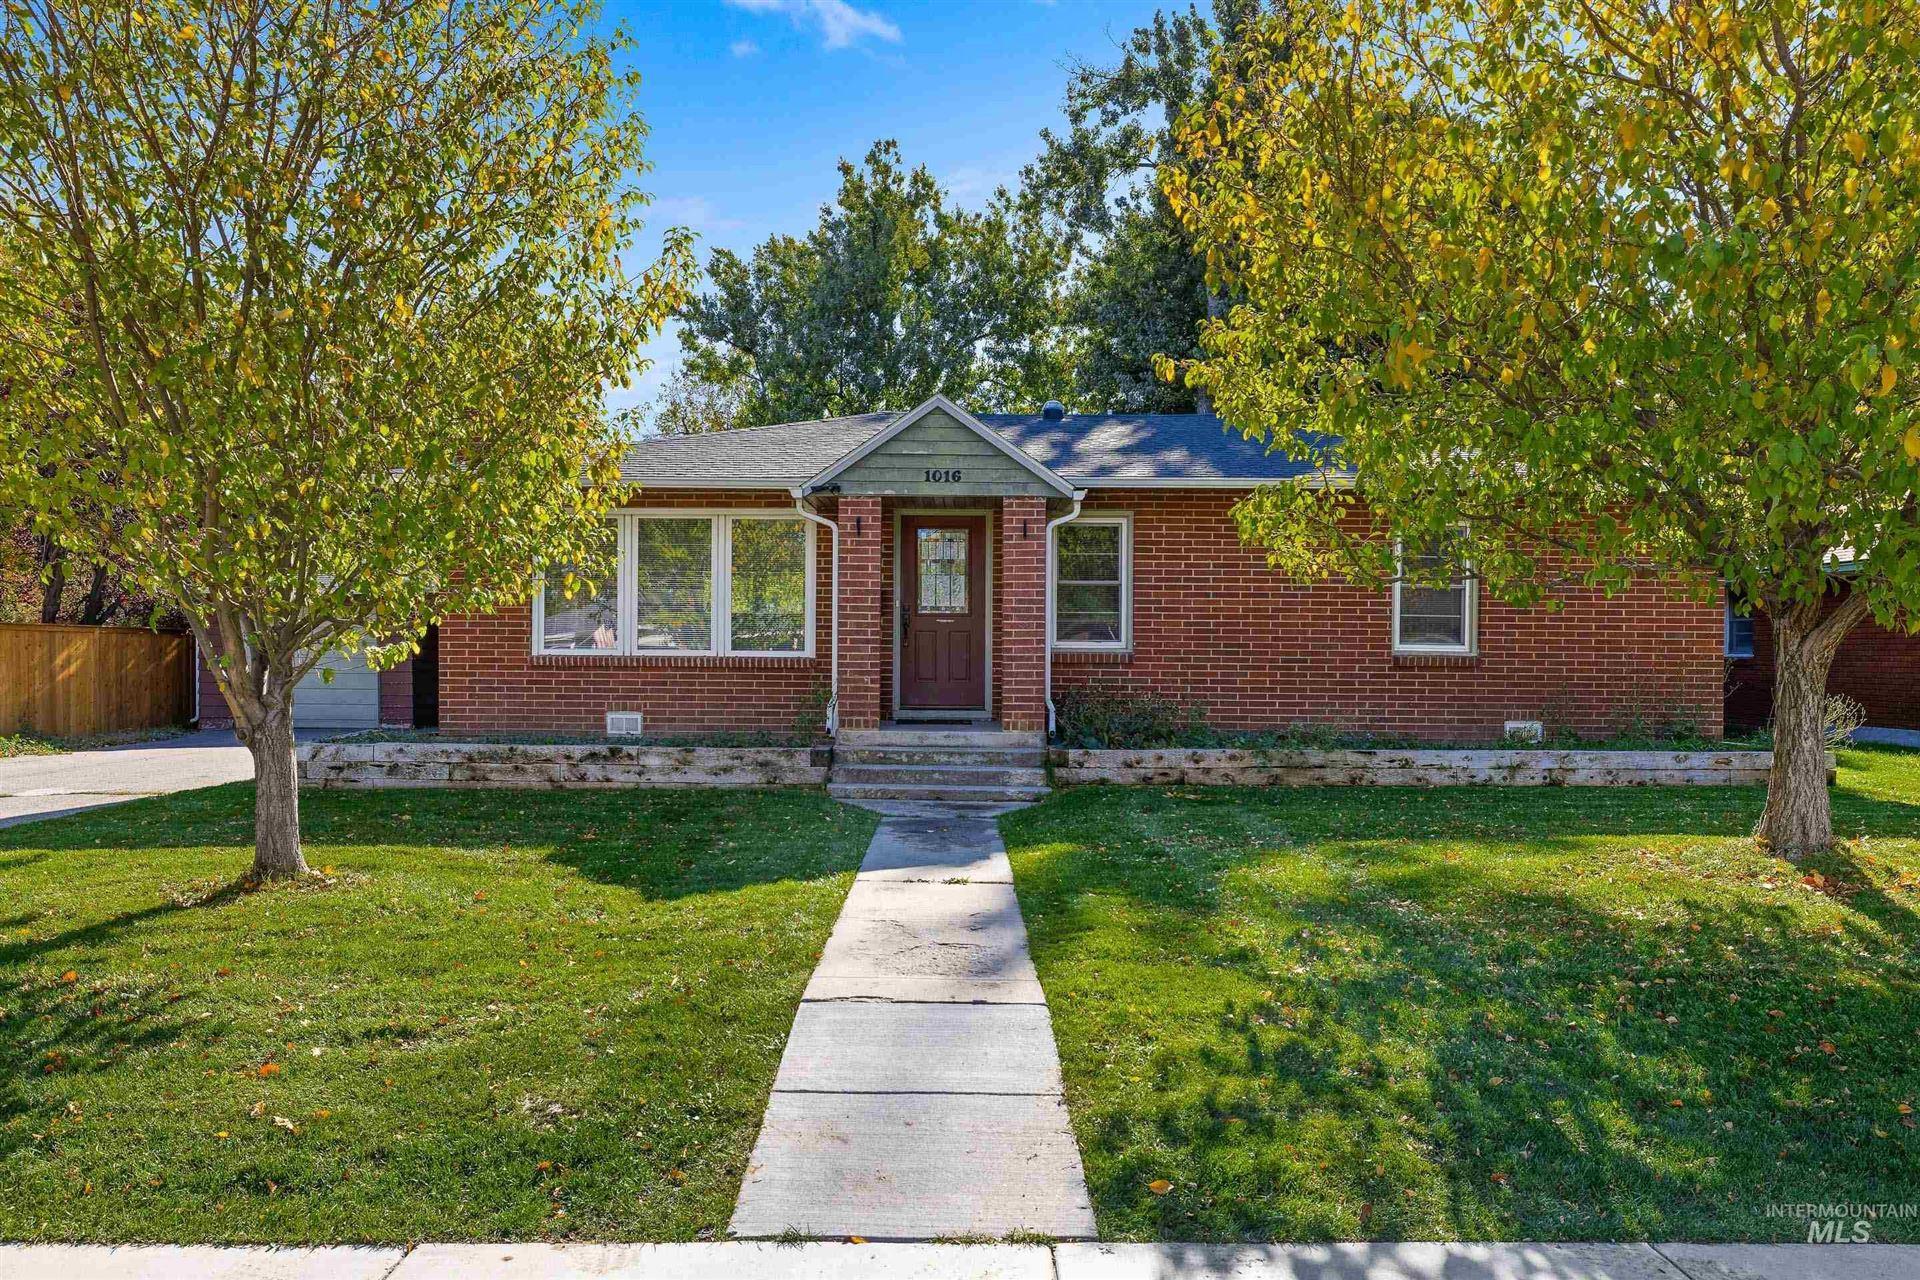 1016 S Cameron St, Boise, ID 83709 - MLS#: 98822307